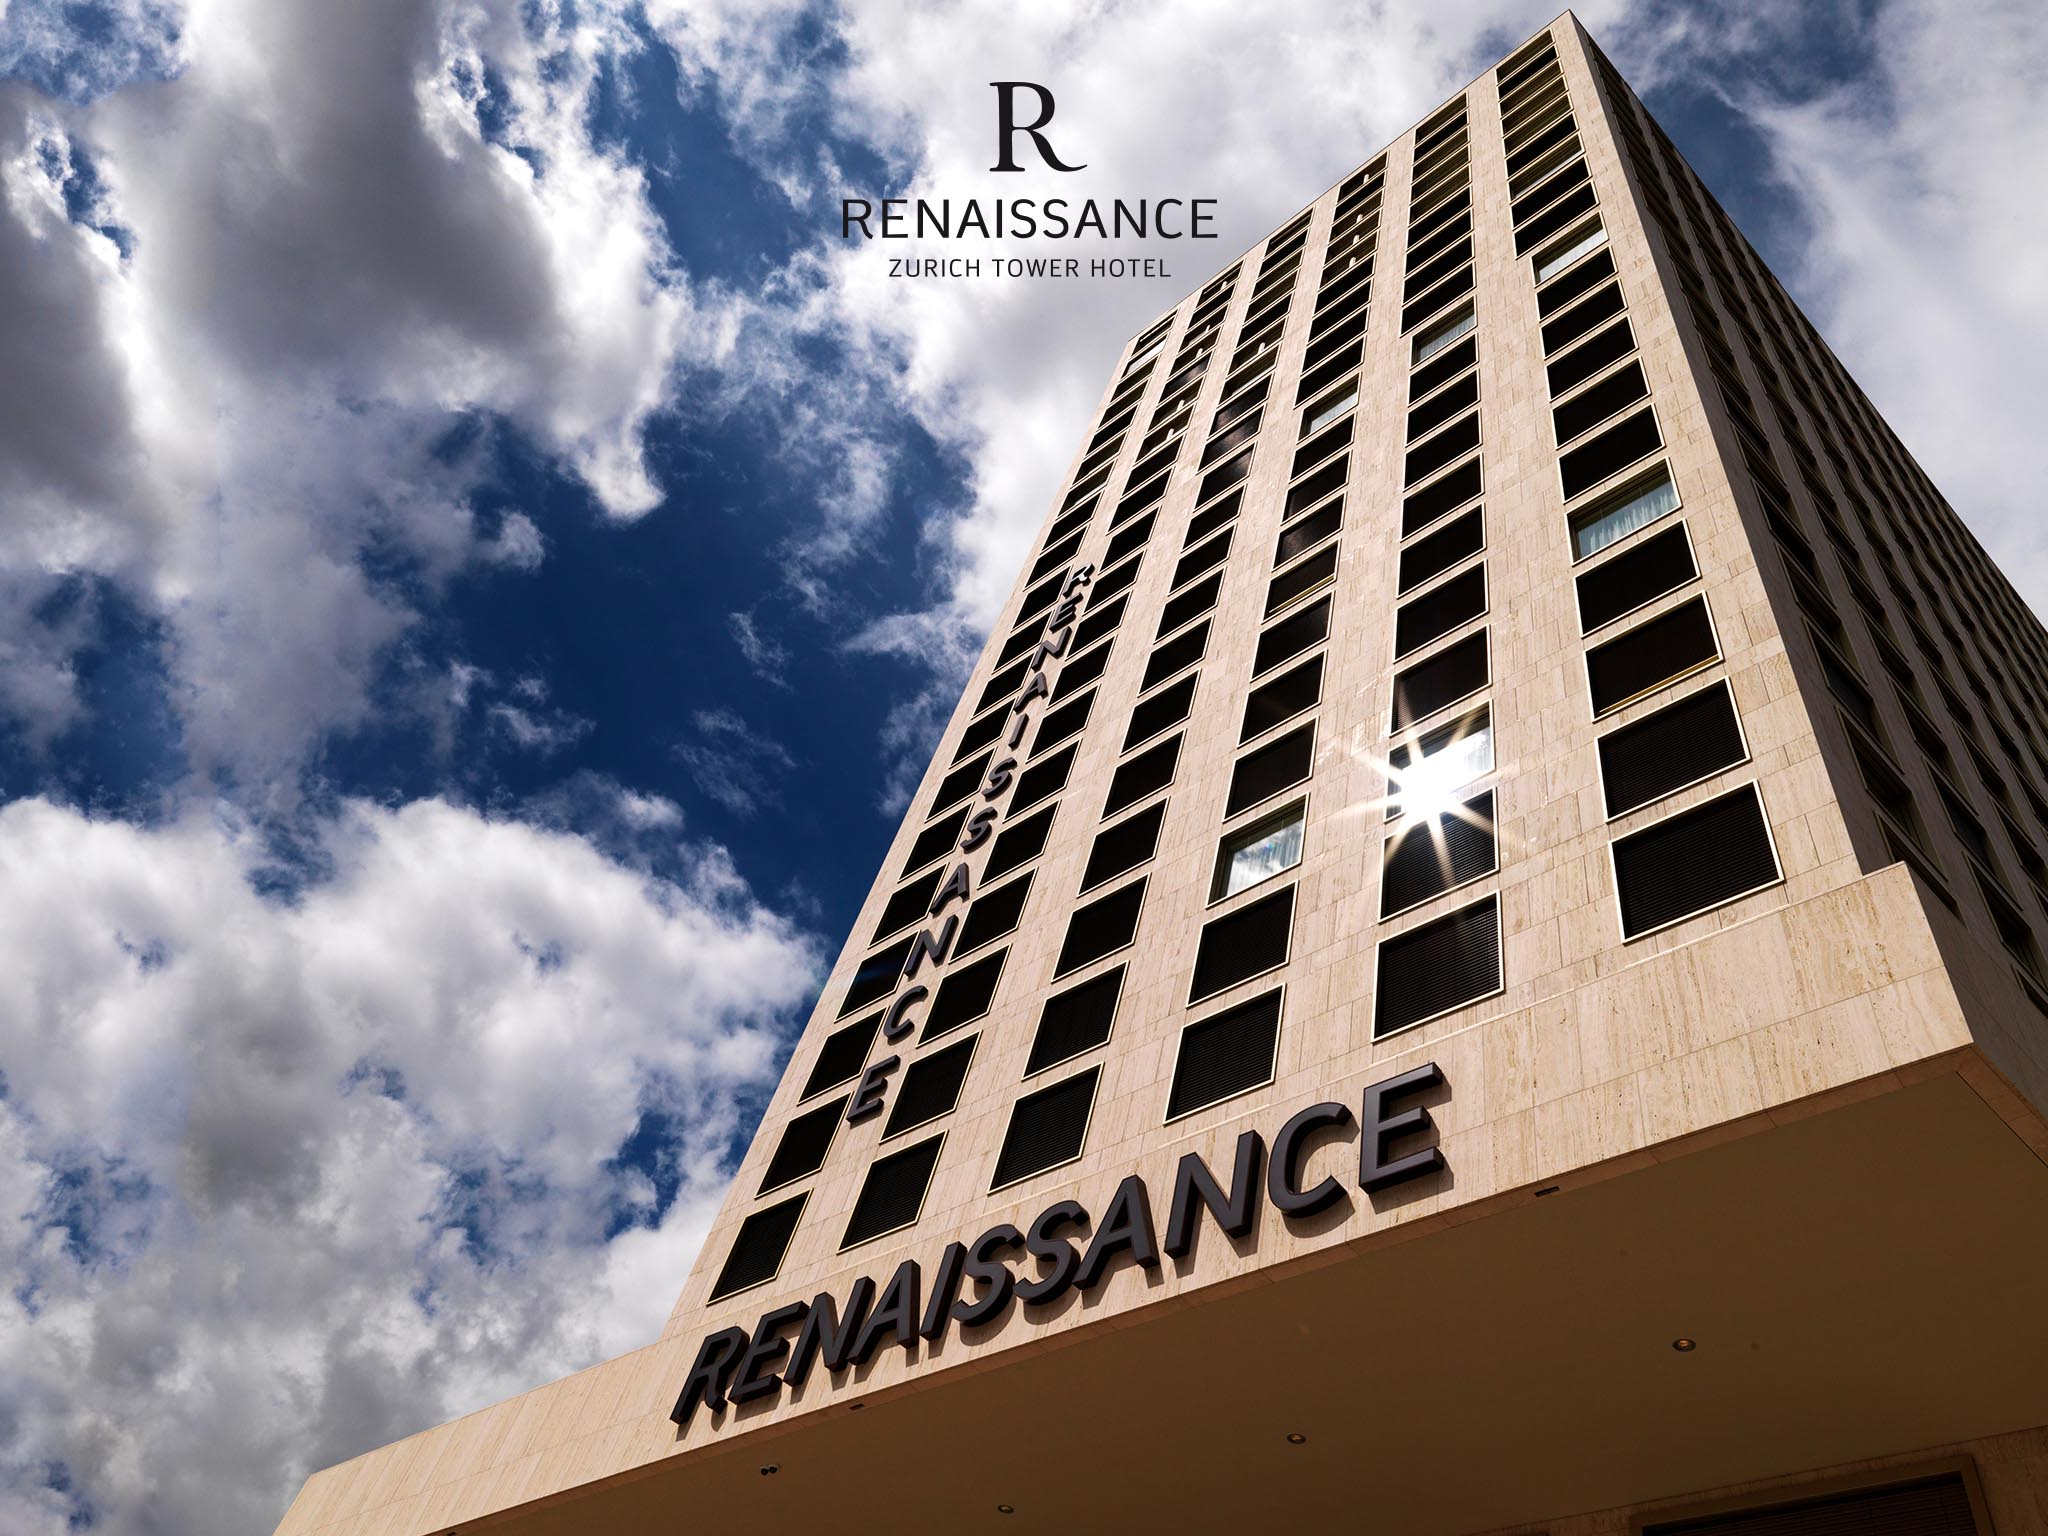 otrum as renaissance z rich tower hotel rh otrum com renaissance zurich tower hotel booking renaissance zurich tower hotel booking